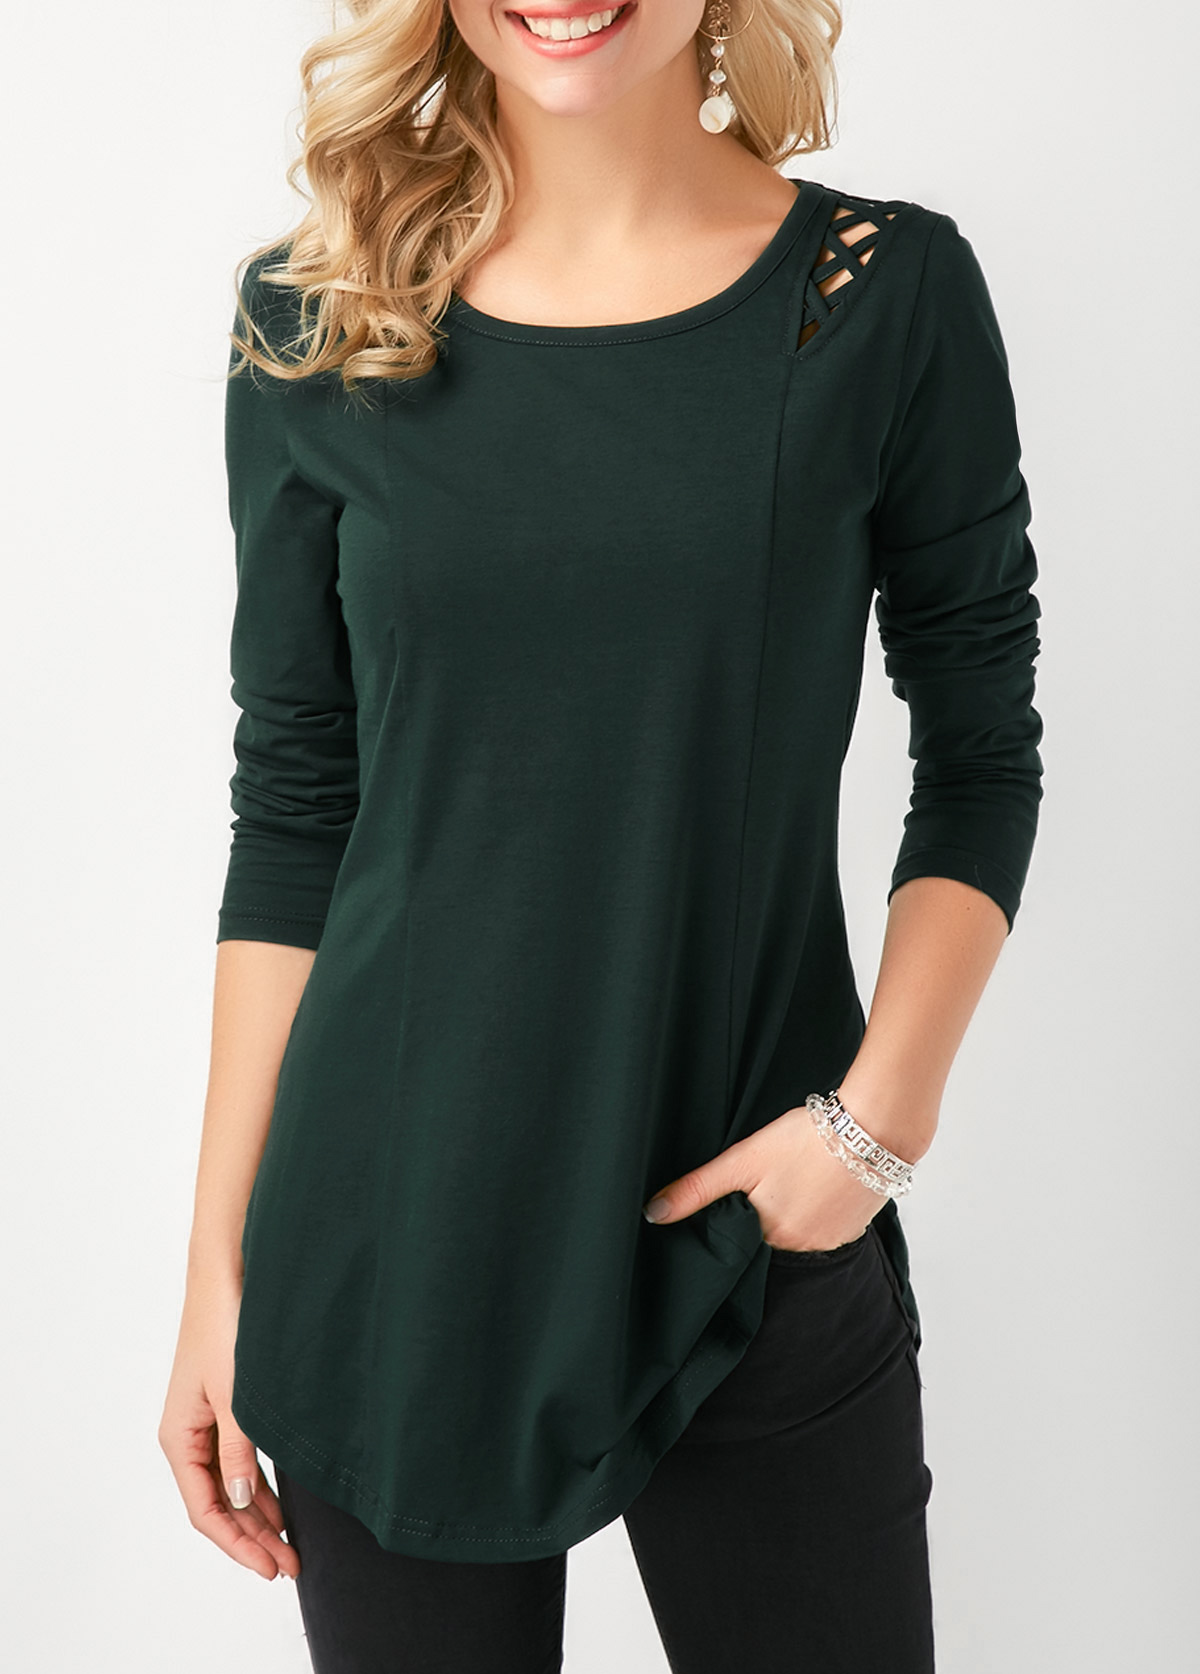 Curved Hem Lace Up Long Sleeve T Shirt